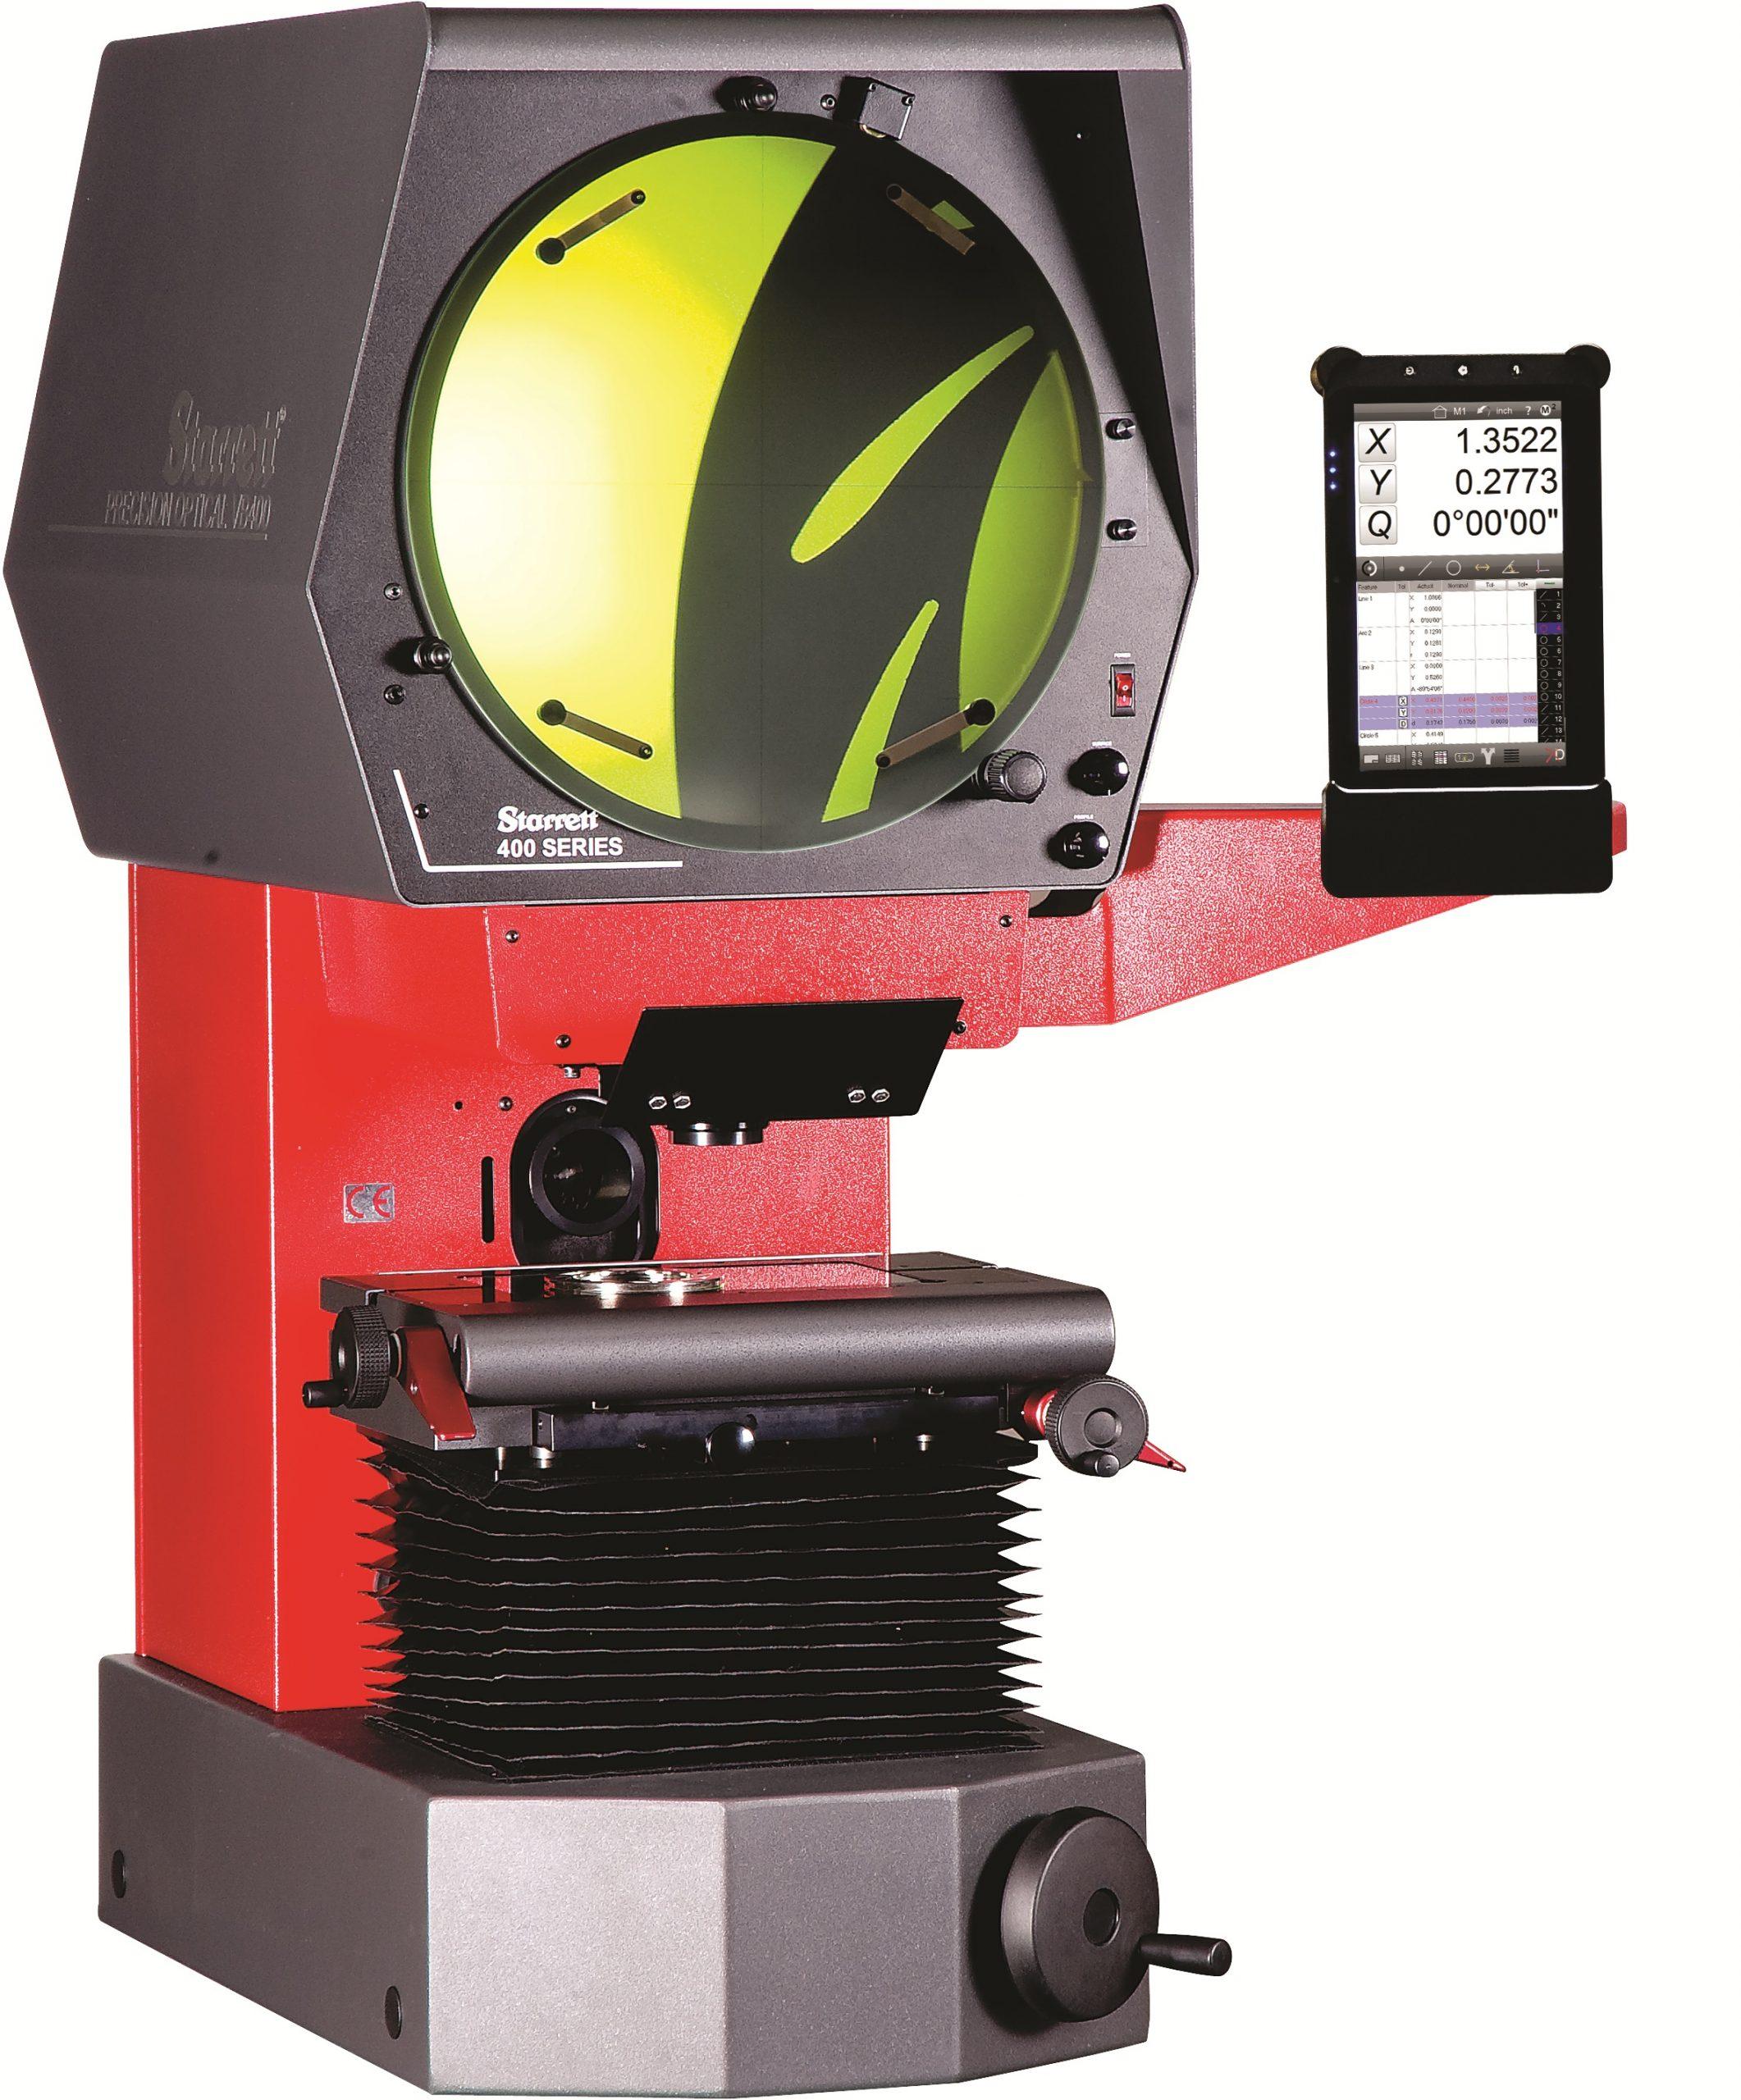 Starrett VB400, Bench Top Vertical Optical Comparator, 8 x 4 Travel